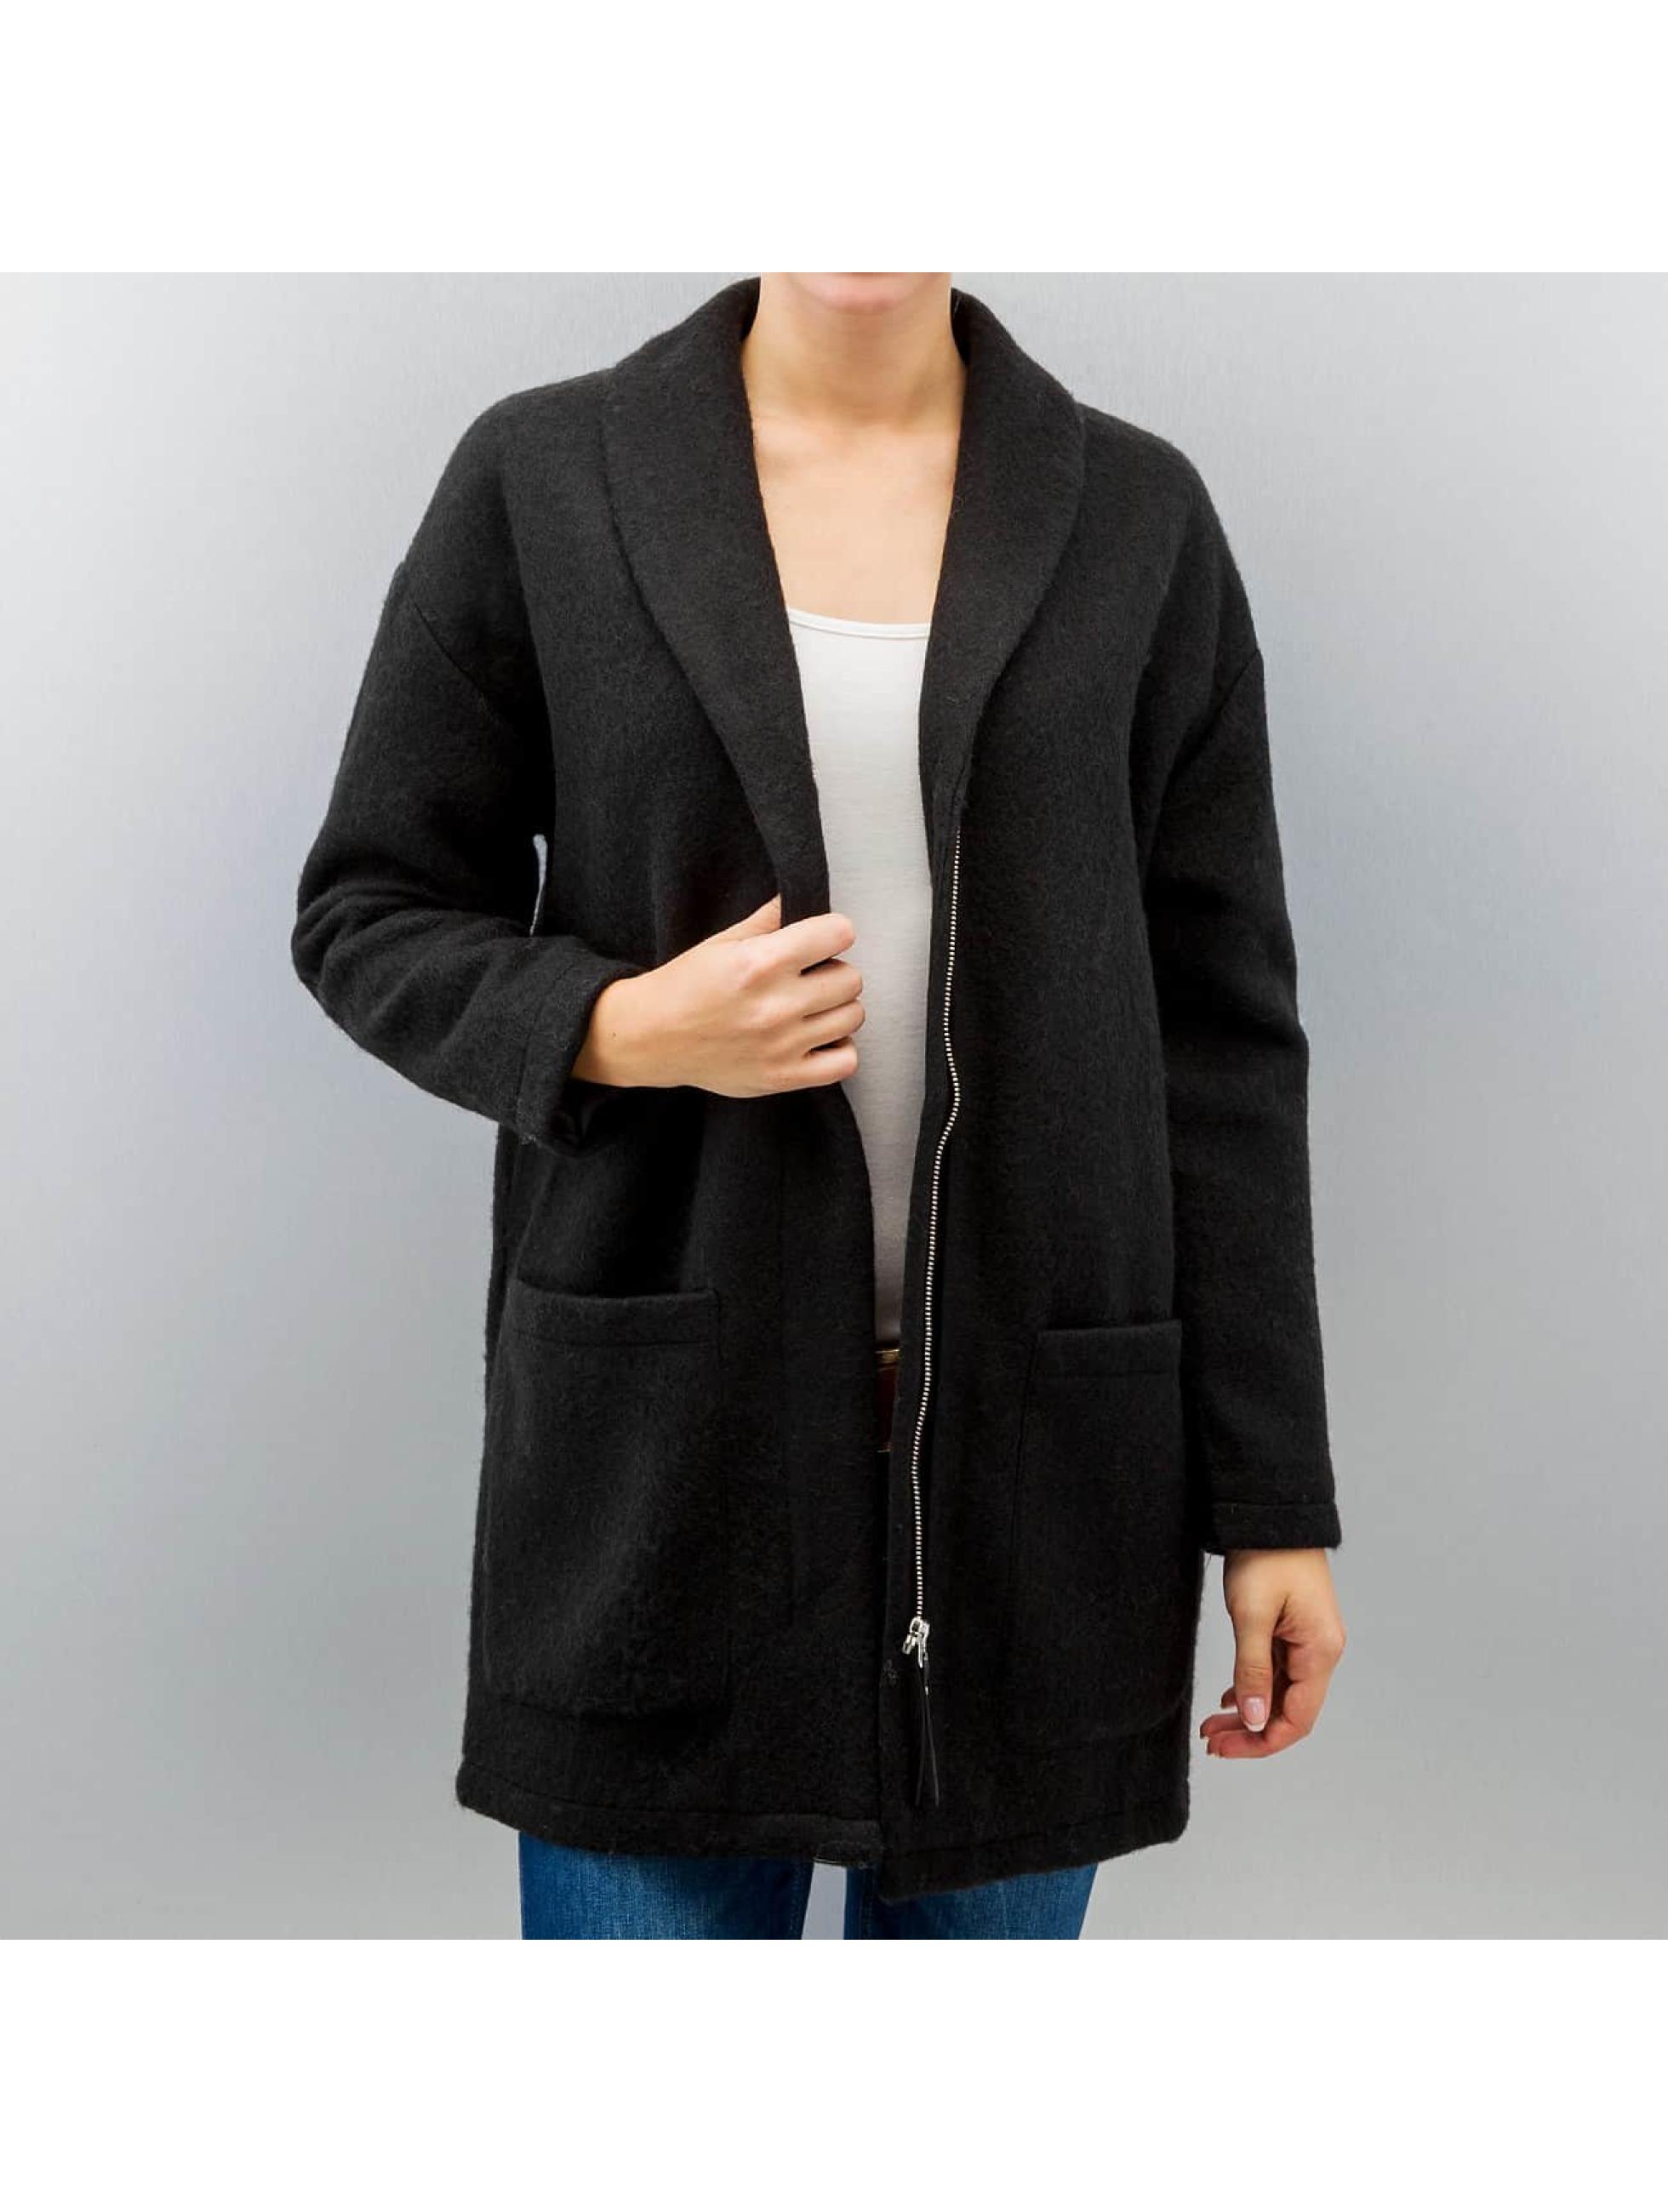 Mantel Aylin in schwarz